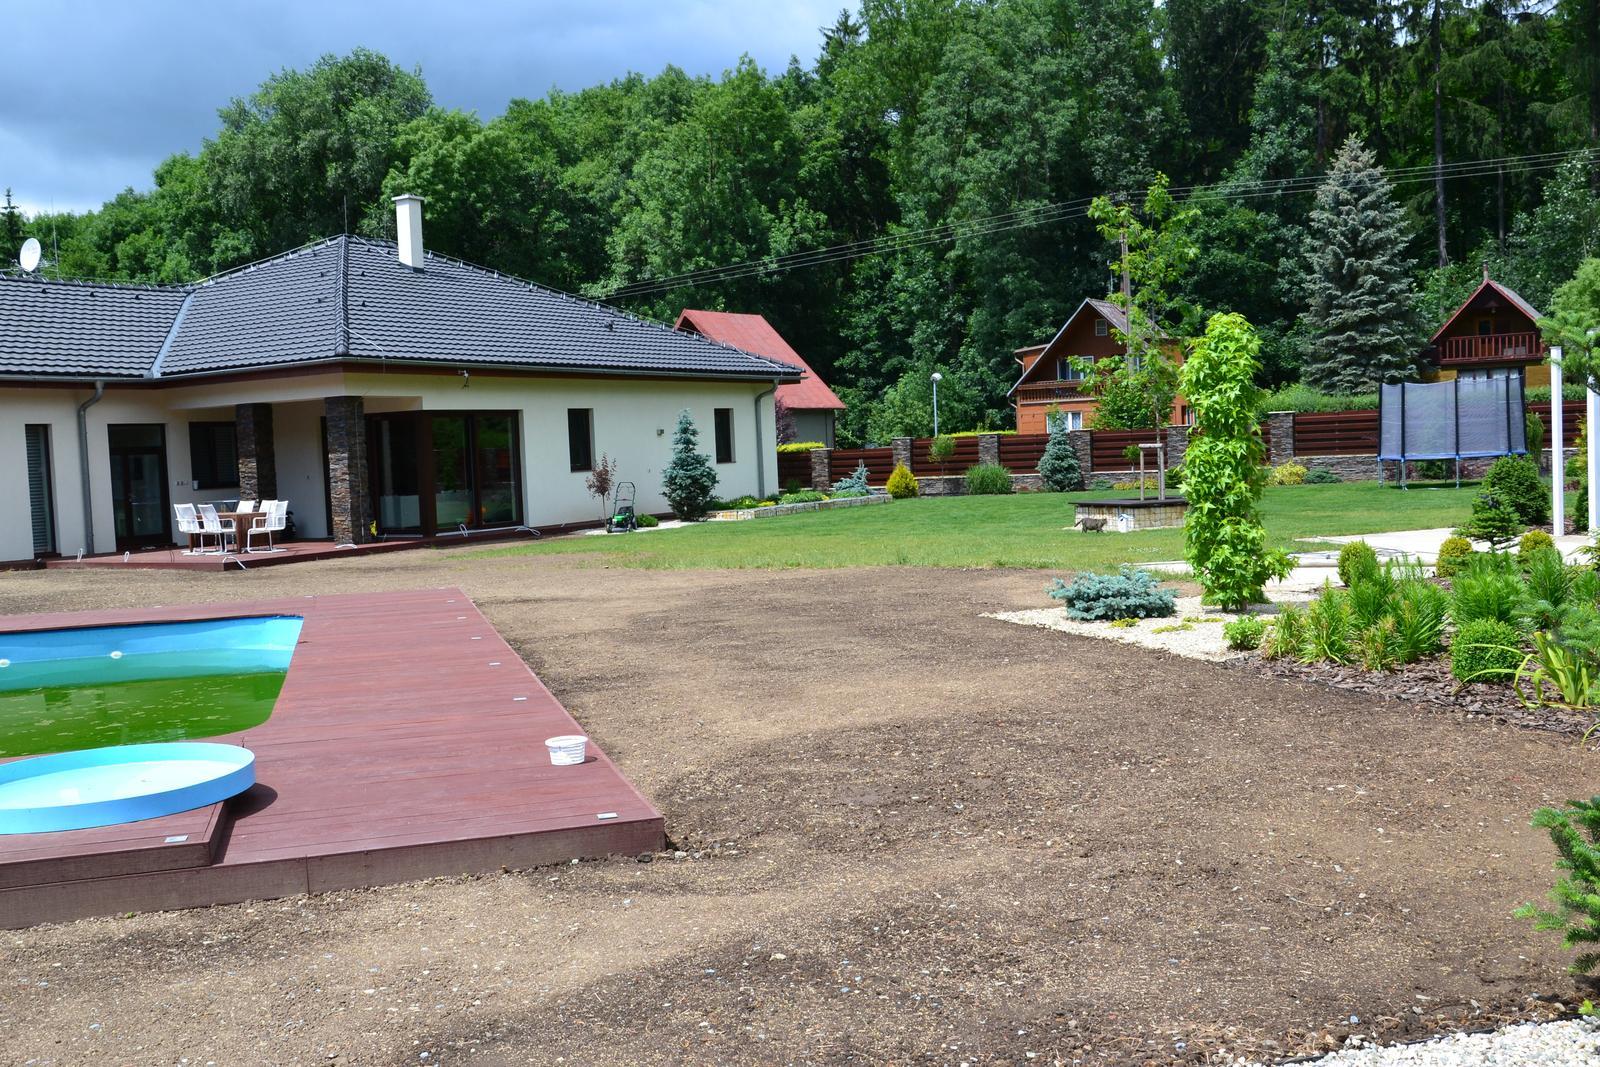 Zahrada - Obrázek č. 101